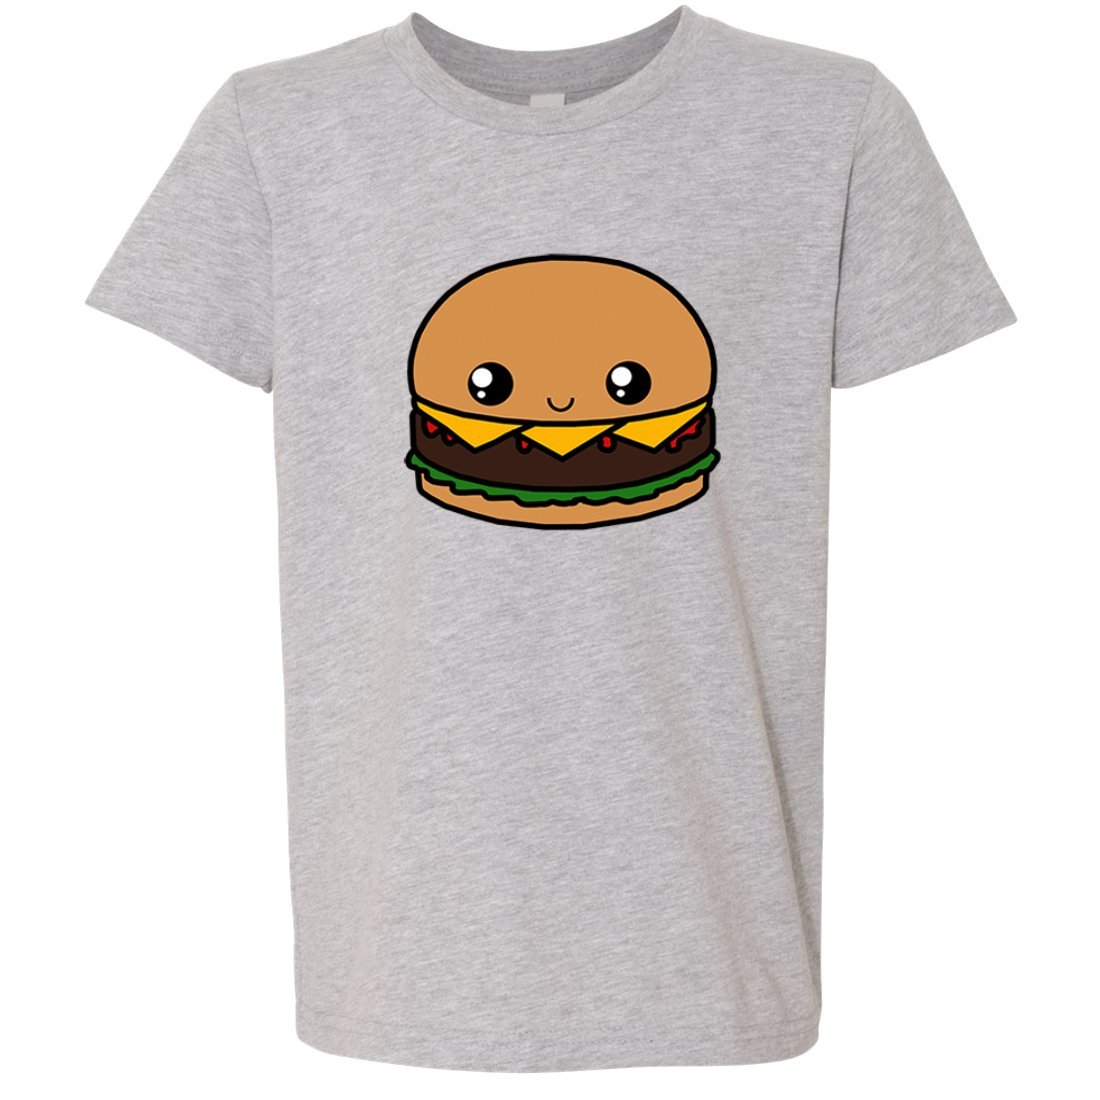 Kawaii Burger Asst Colors Youth T-Shirt//tee